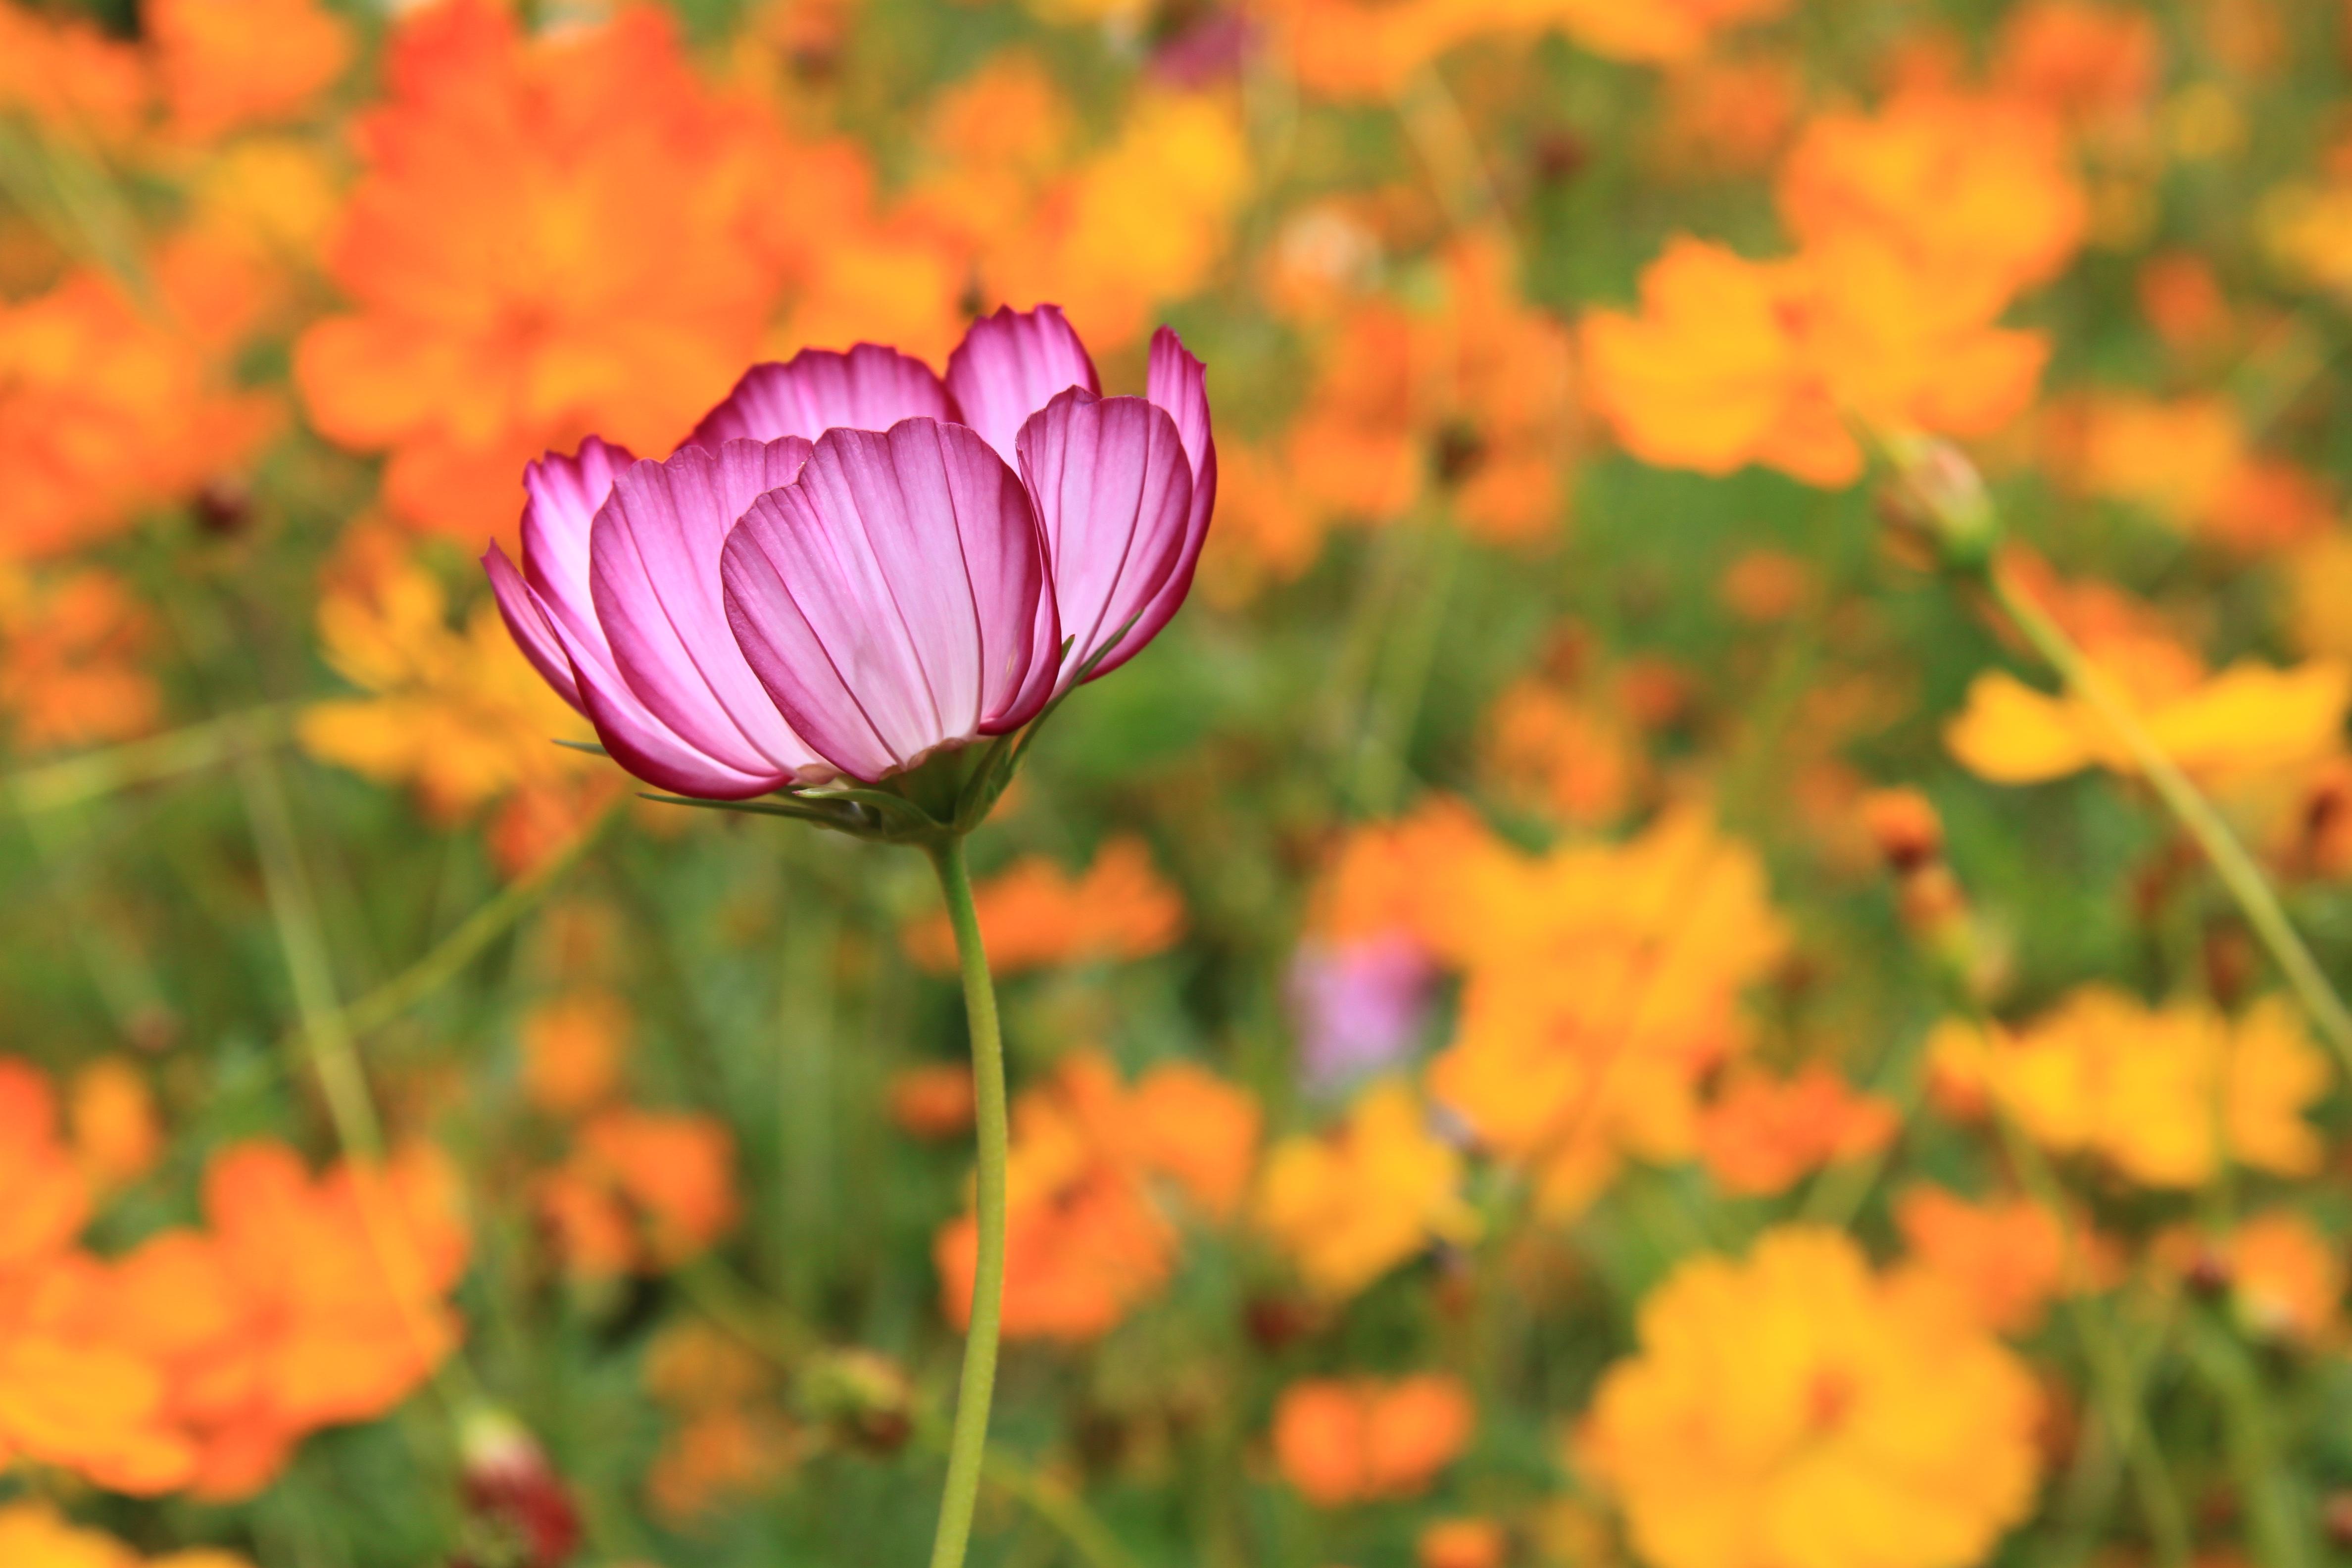 File Fleur Violette Sur Fond Orange Jpg Wikimedia Commons